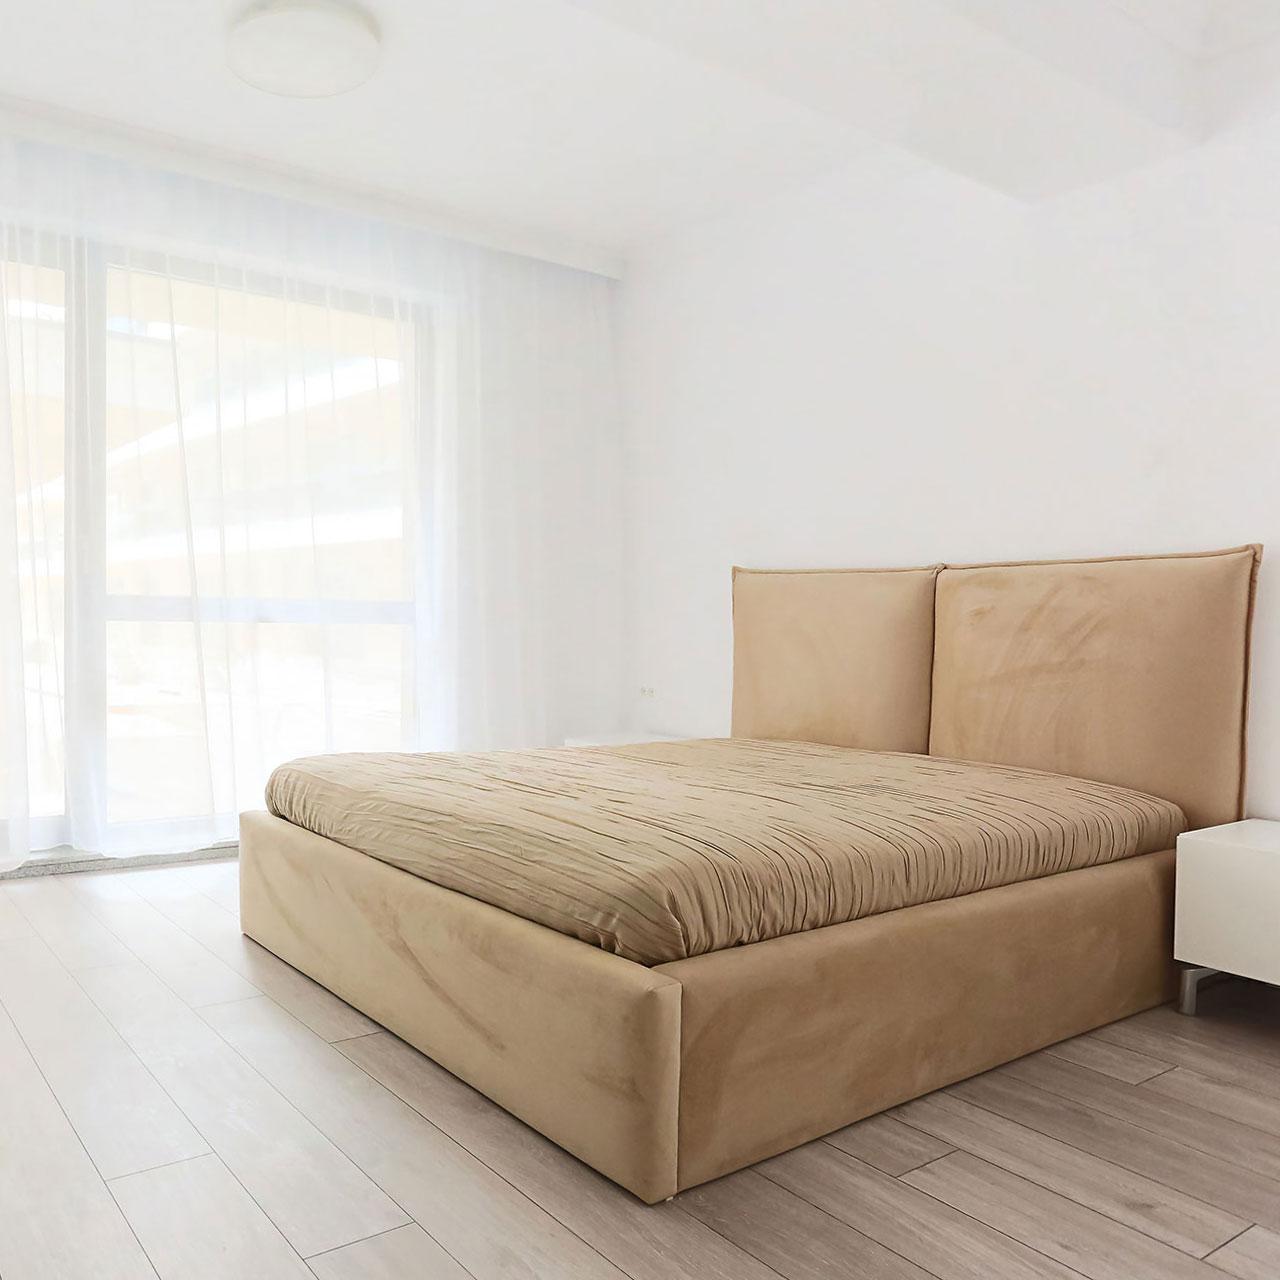 Apartamente de vanzare Bucuresti - Catedral Residence - Marriott, Piata Unirii, 13 Septembrie, Izvor - G3 - 8